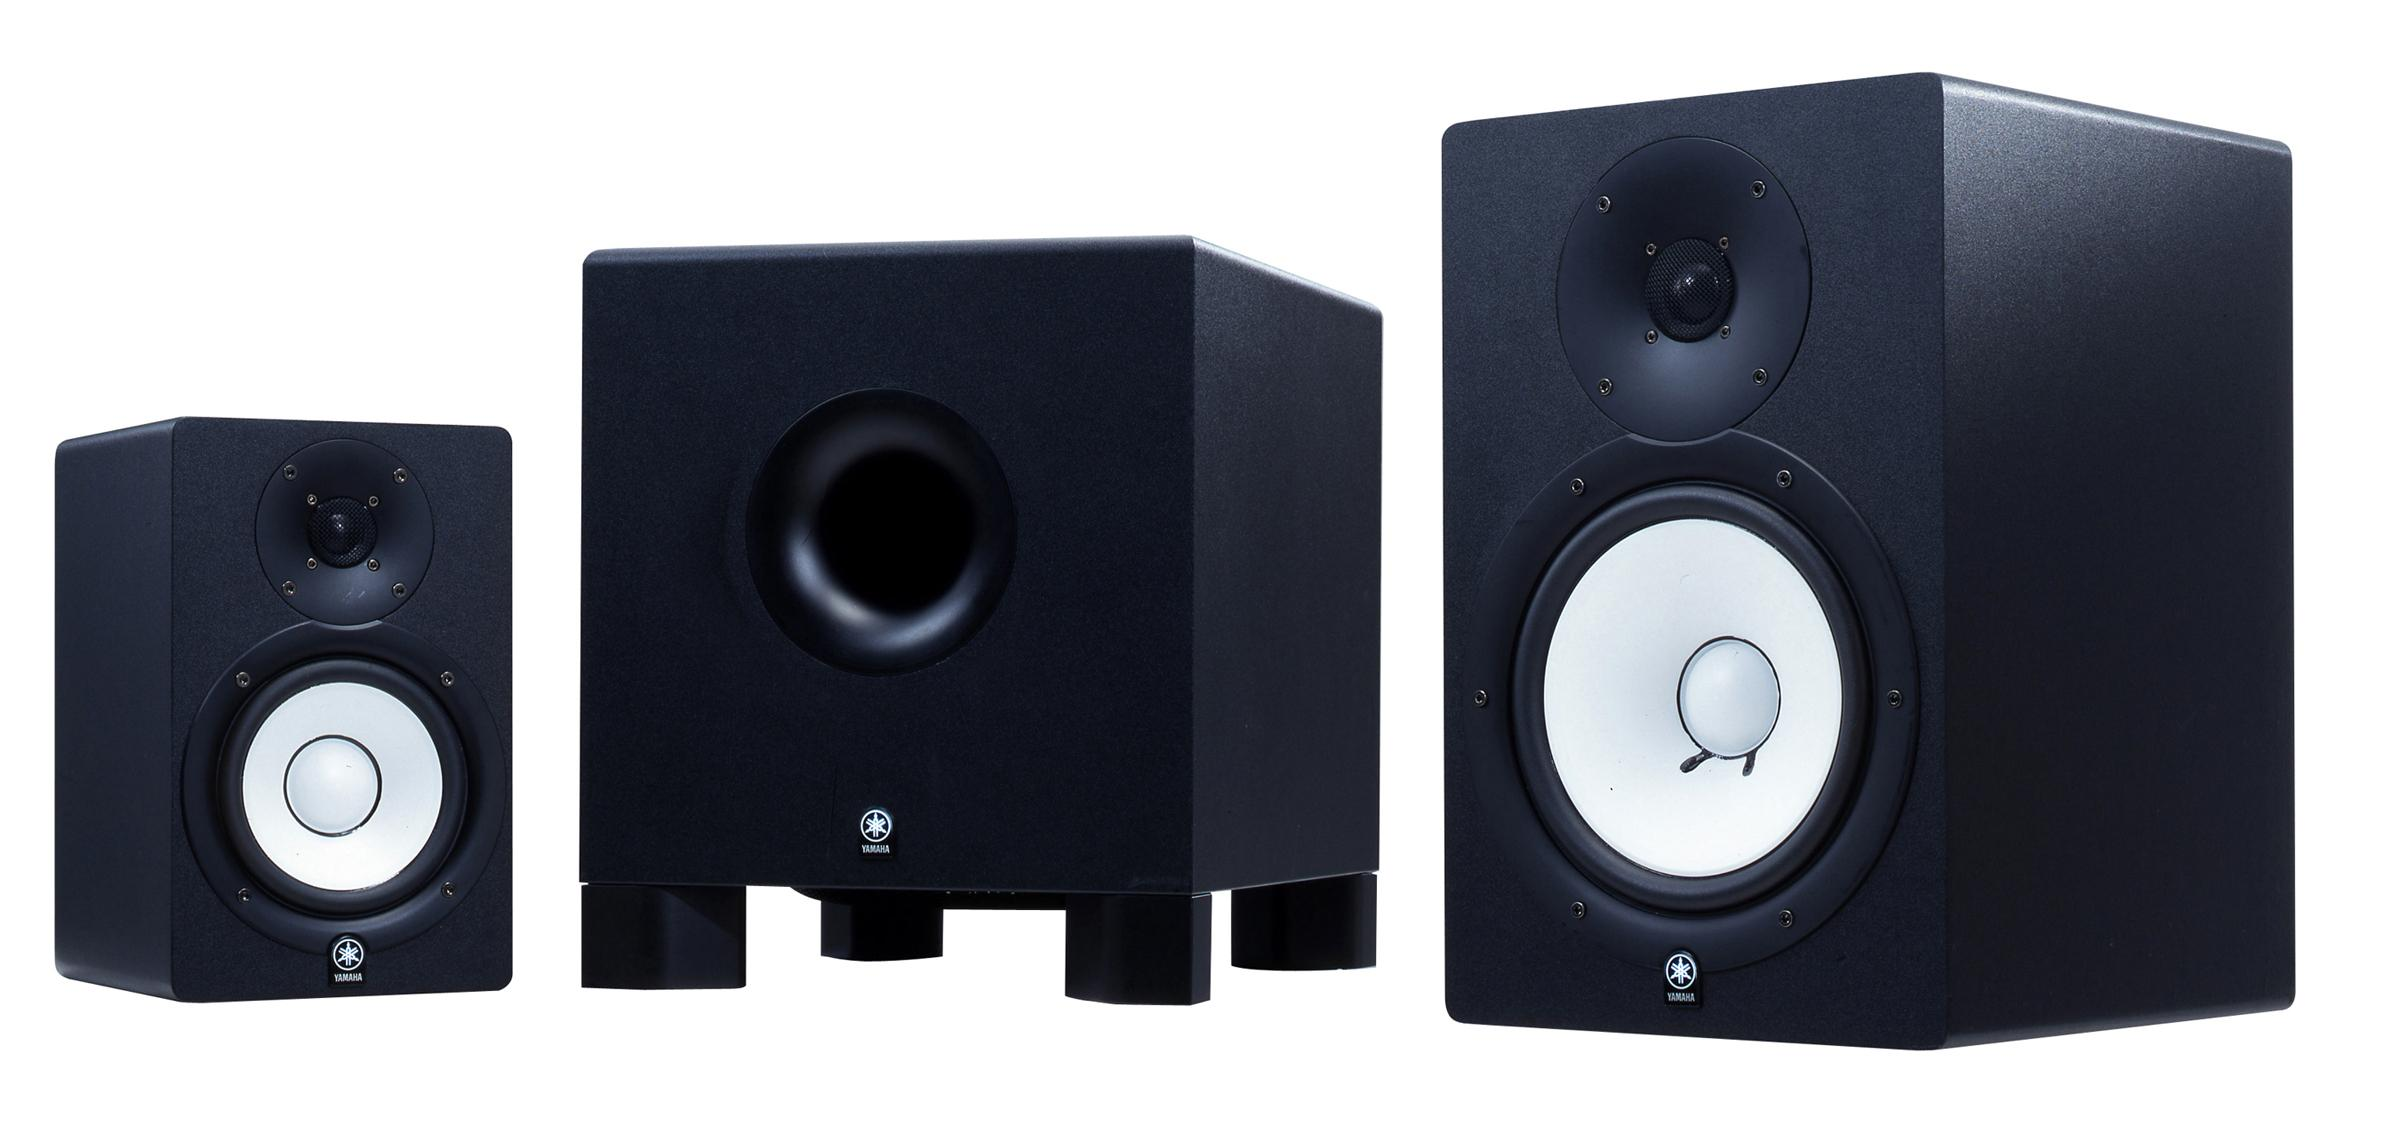 Yamaha hs50m image 478290 audiofanzine for Yamaha hs50m review